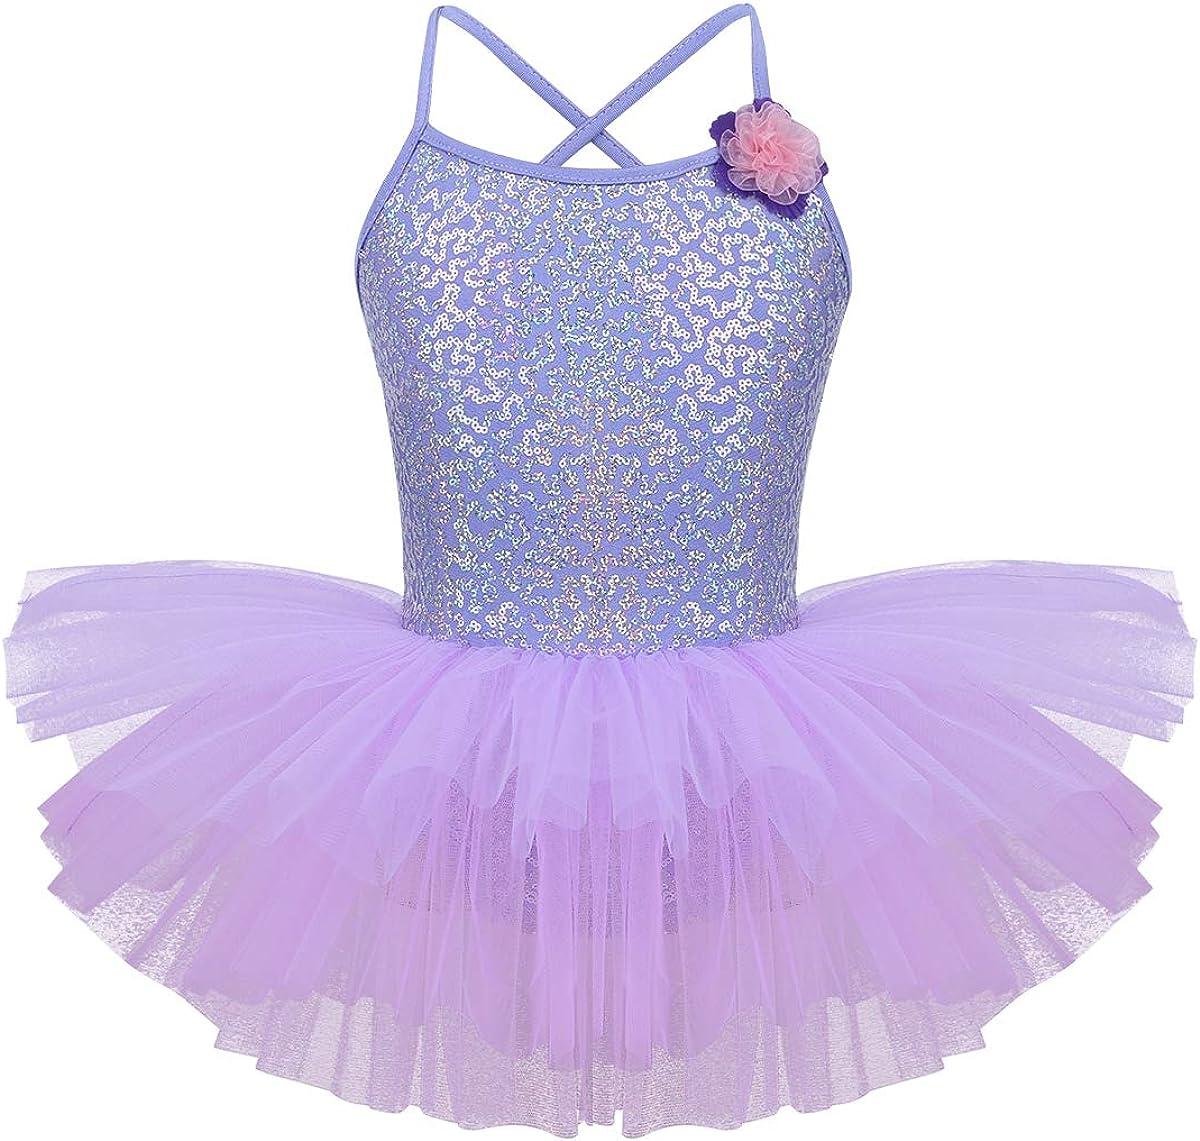 dPois Kids Girls' Spaghetti Straps Shiny Sequined Ballet Dance L